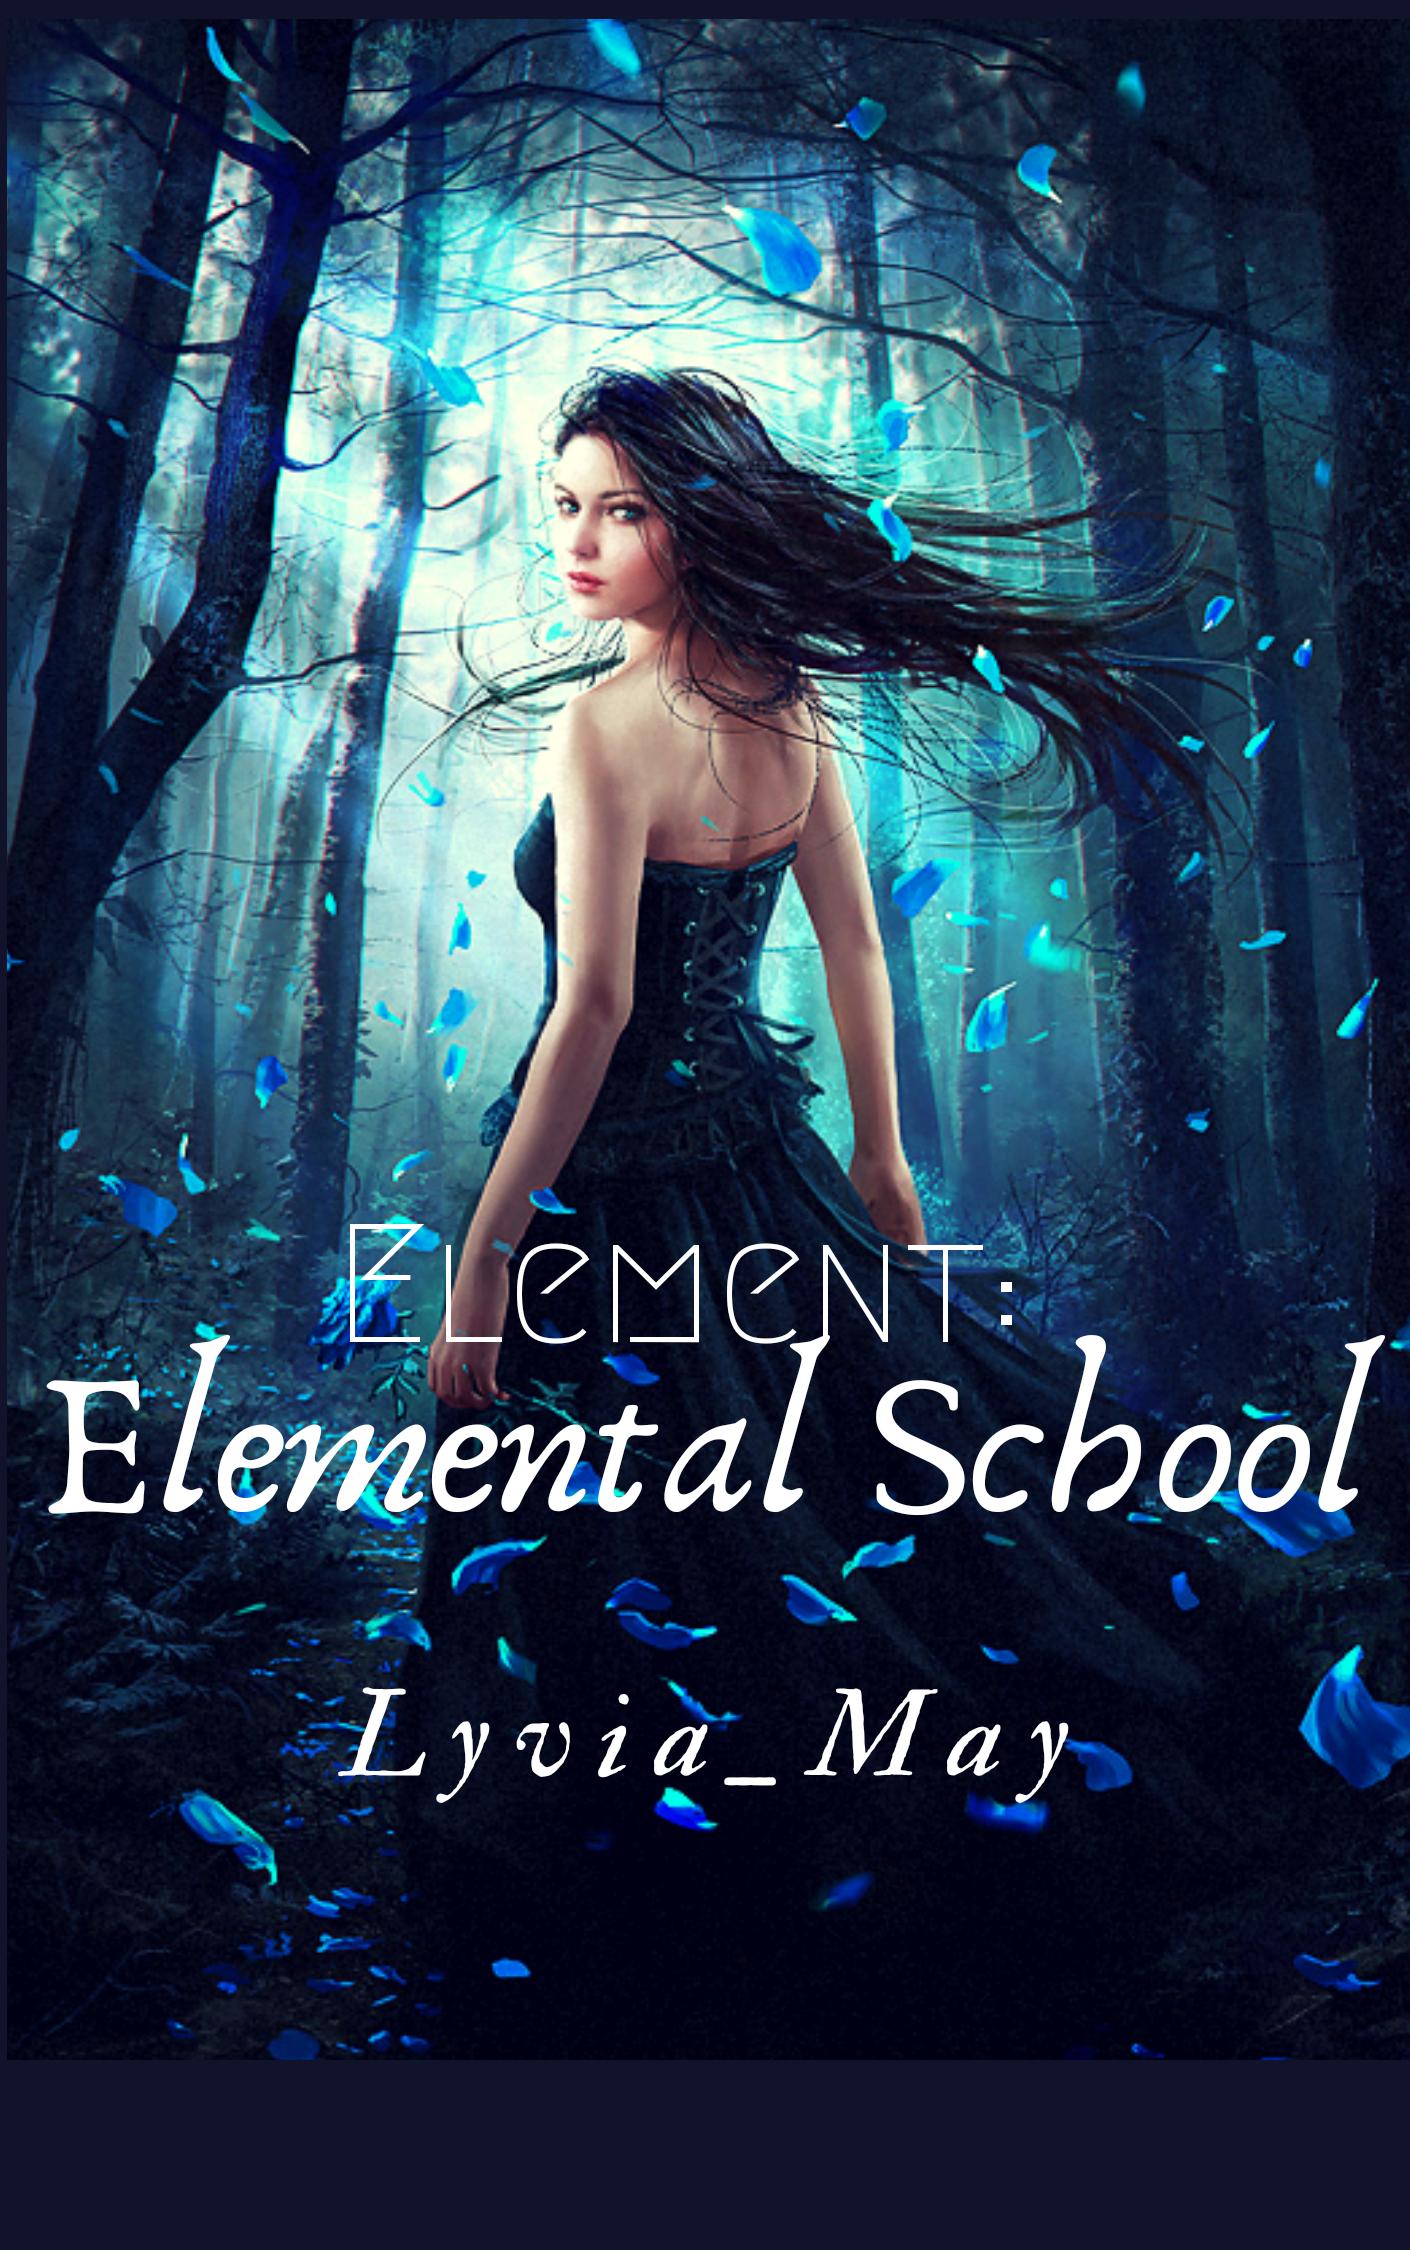 Element: Elemental High School